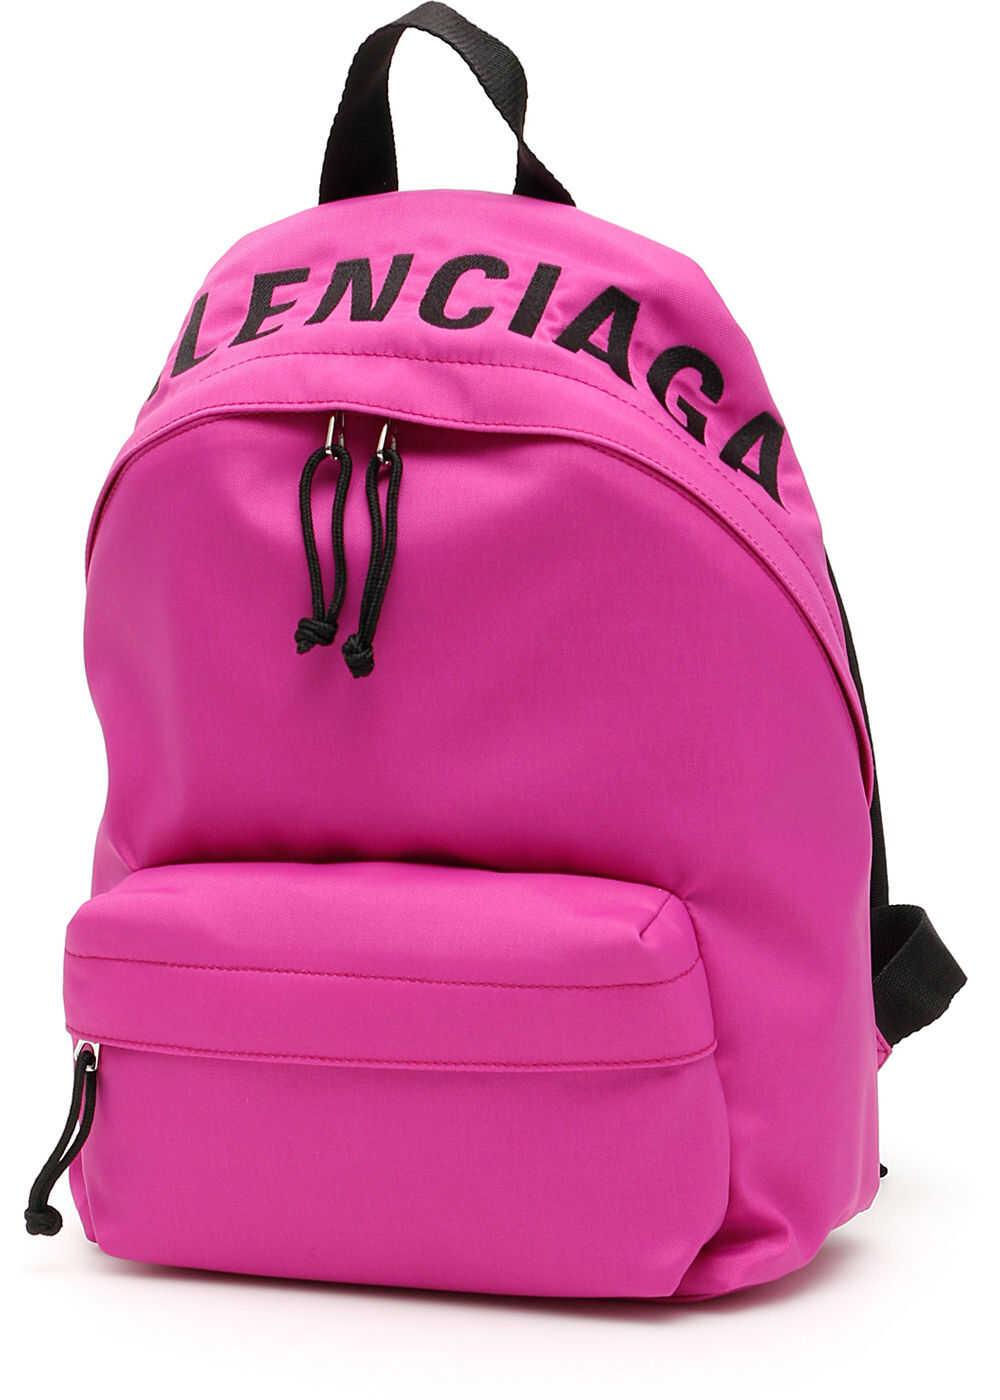 Balenciaga Wheel S Backpack FUCHSIA BLACK